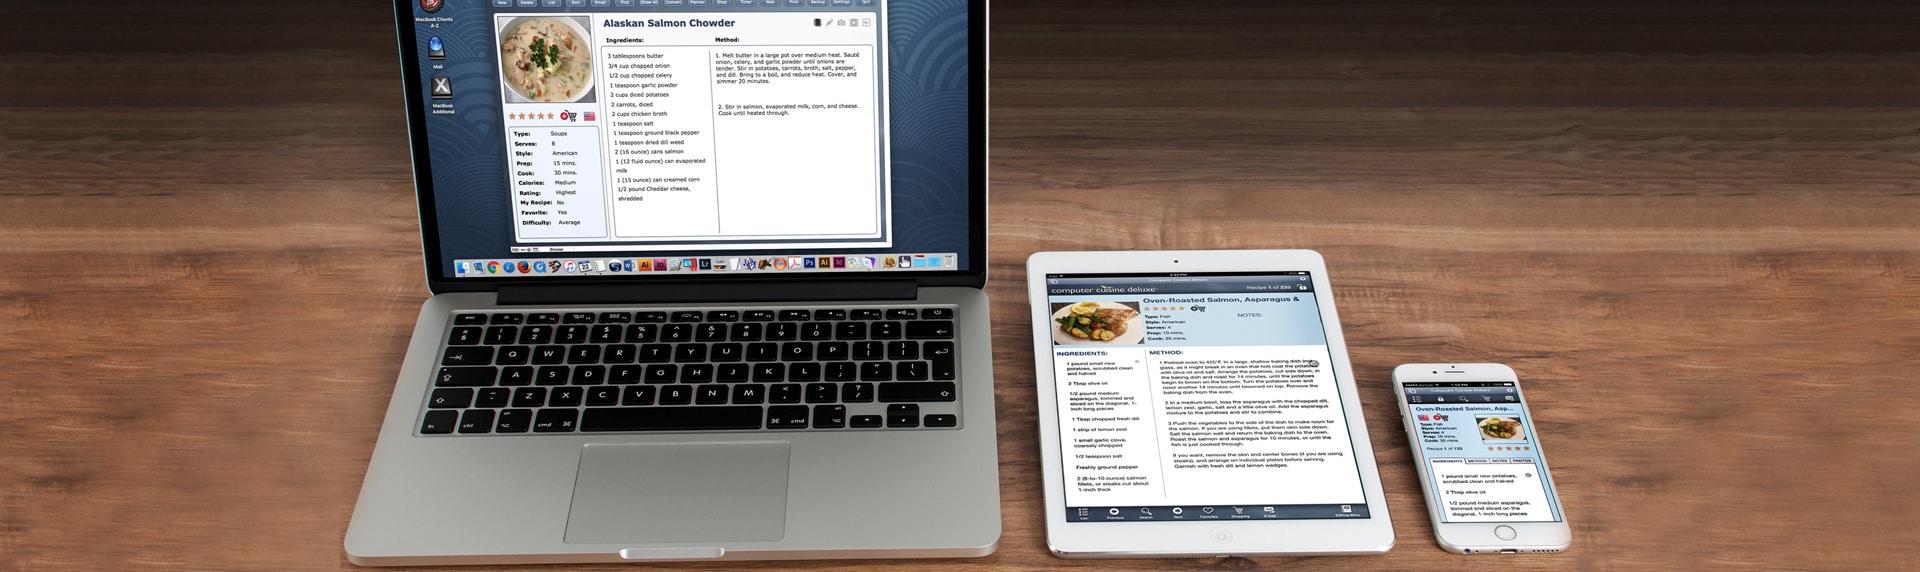 Computer Cuisine Deluxe Mac Recipe Organizer Devices